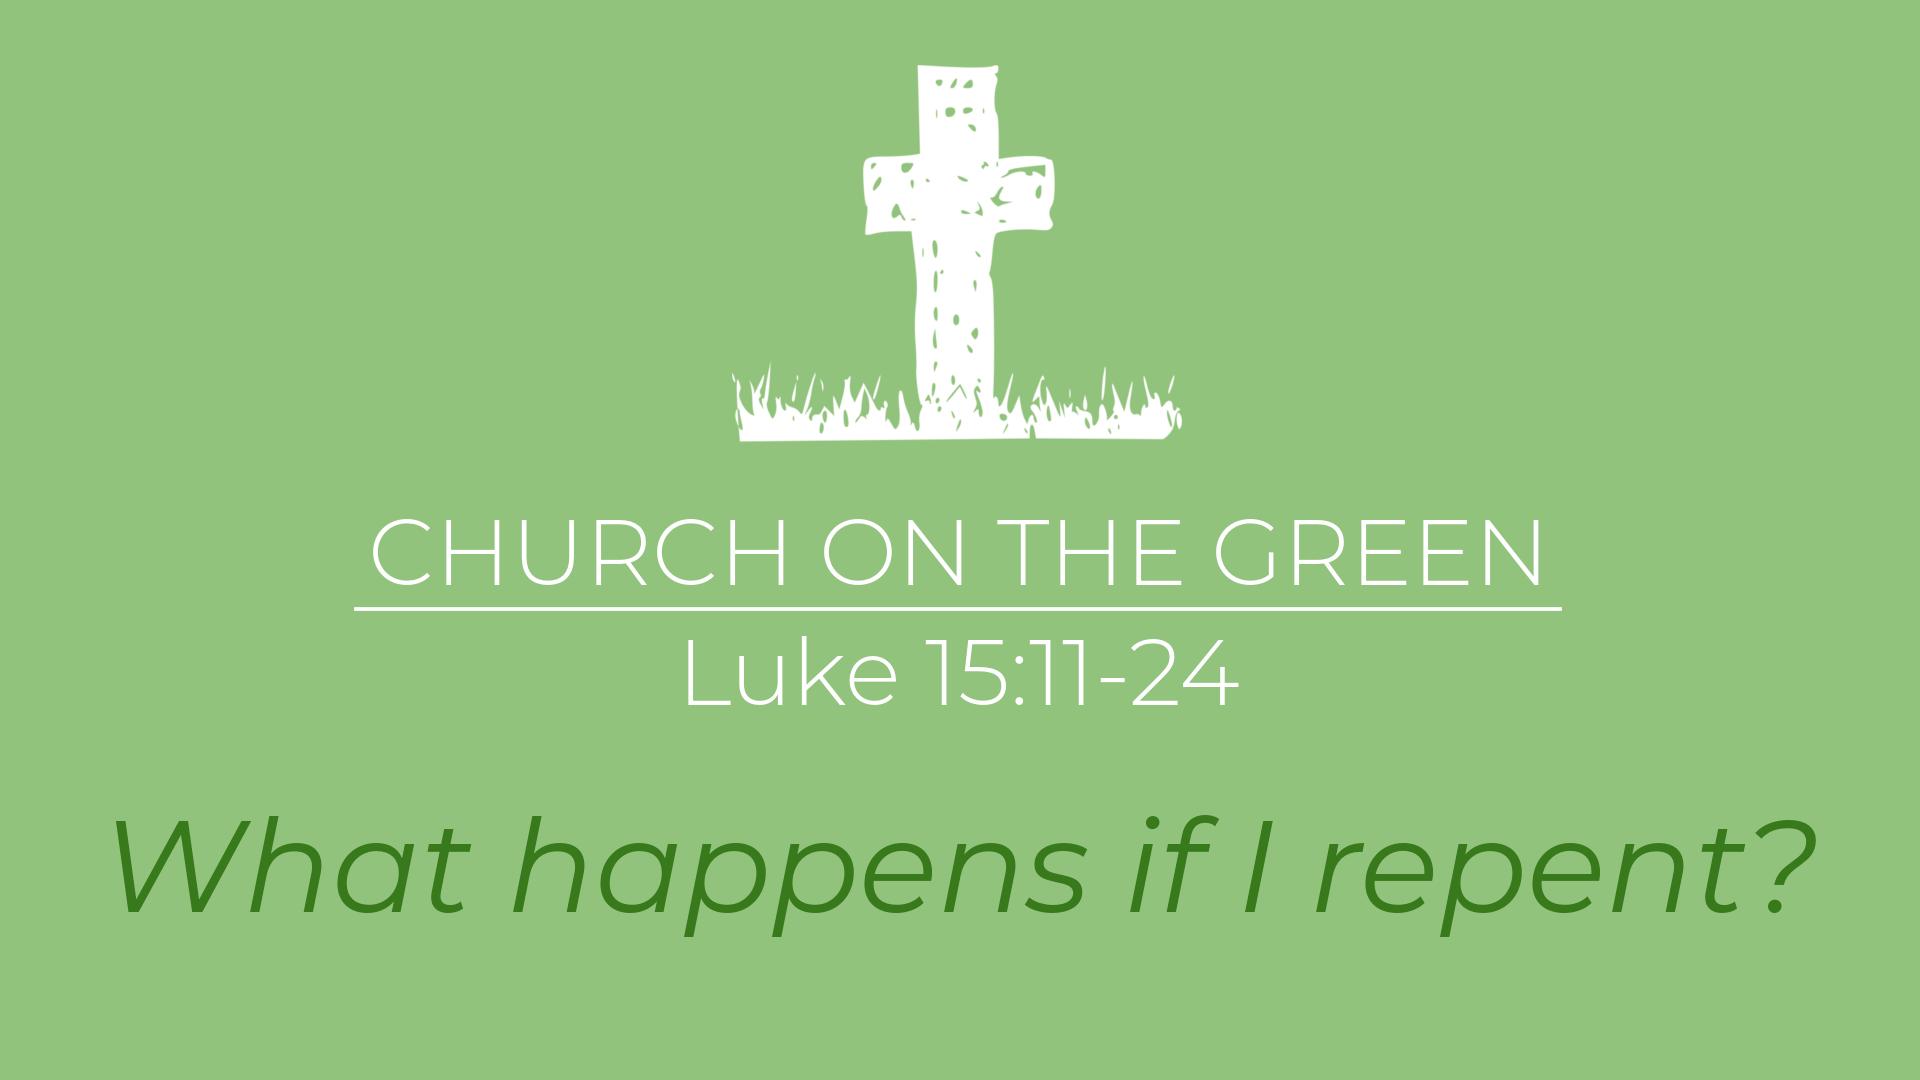 What happens if I repent? (Luke 15:11-24)